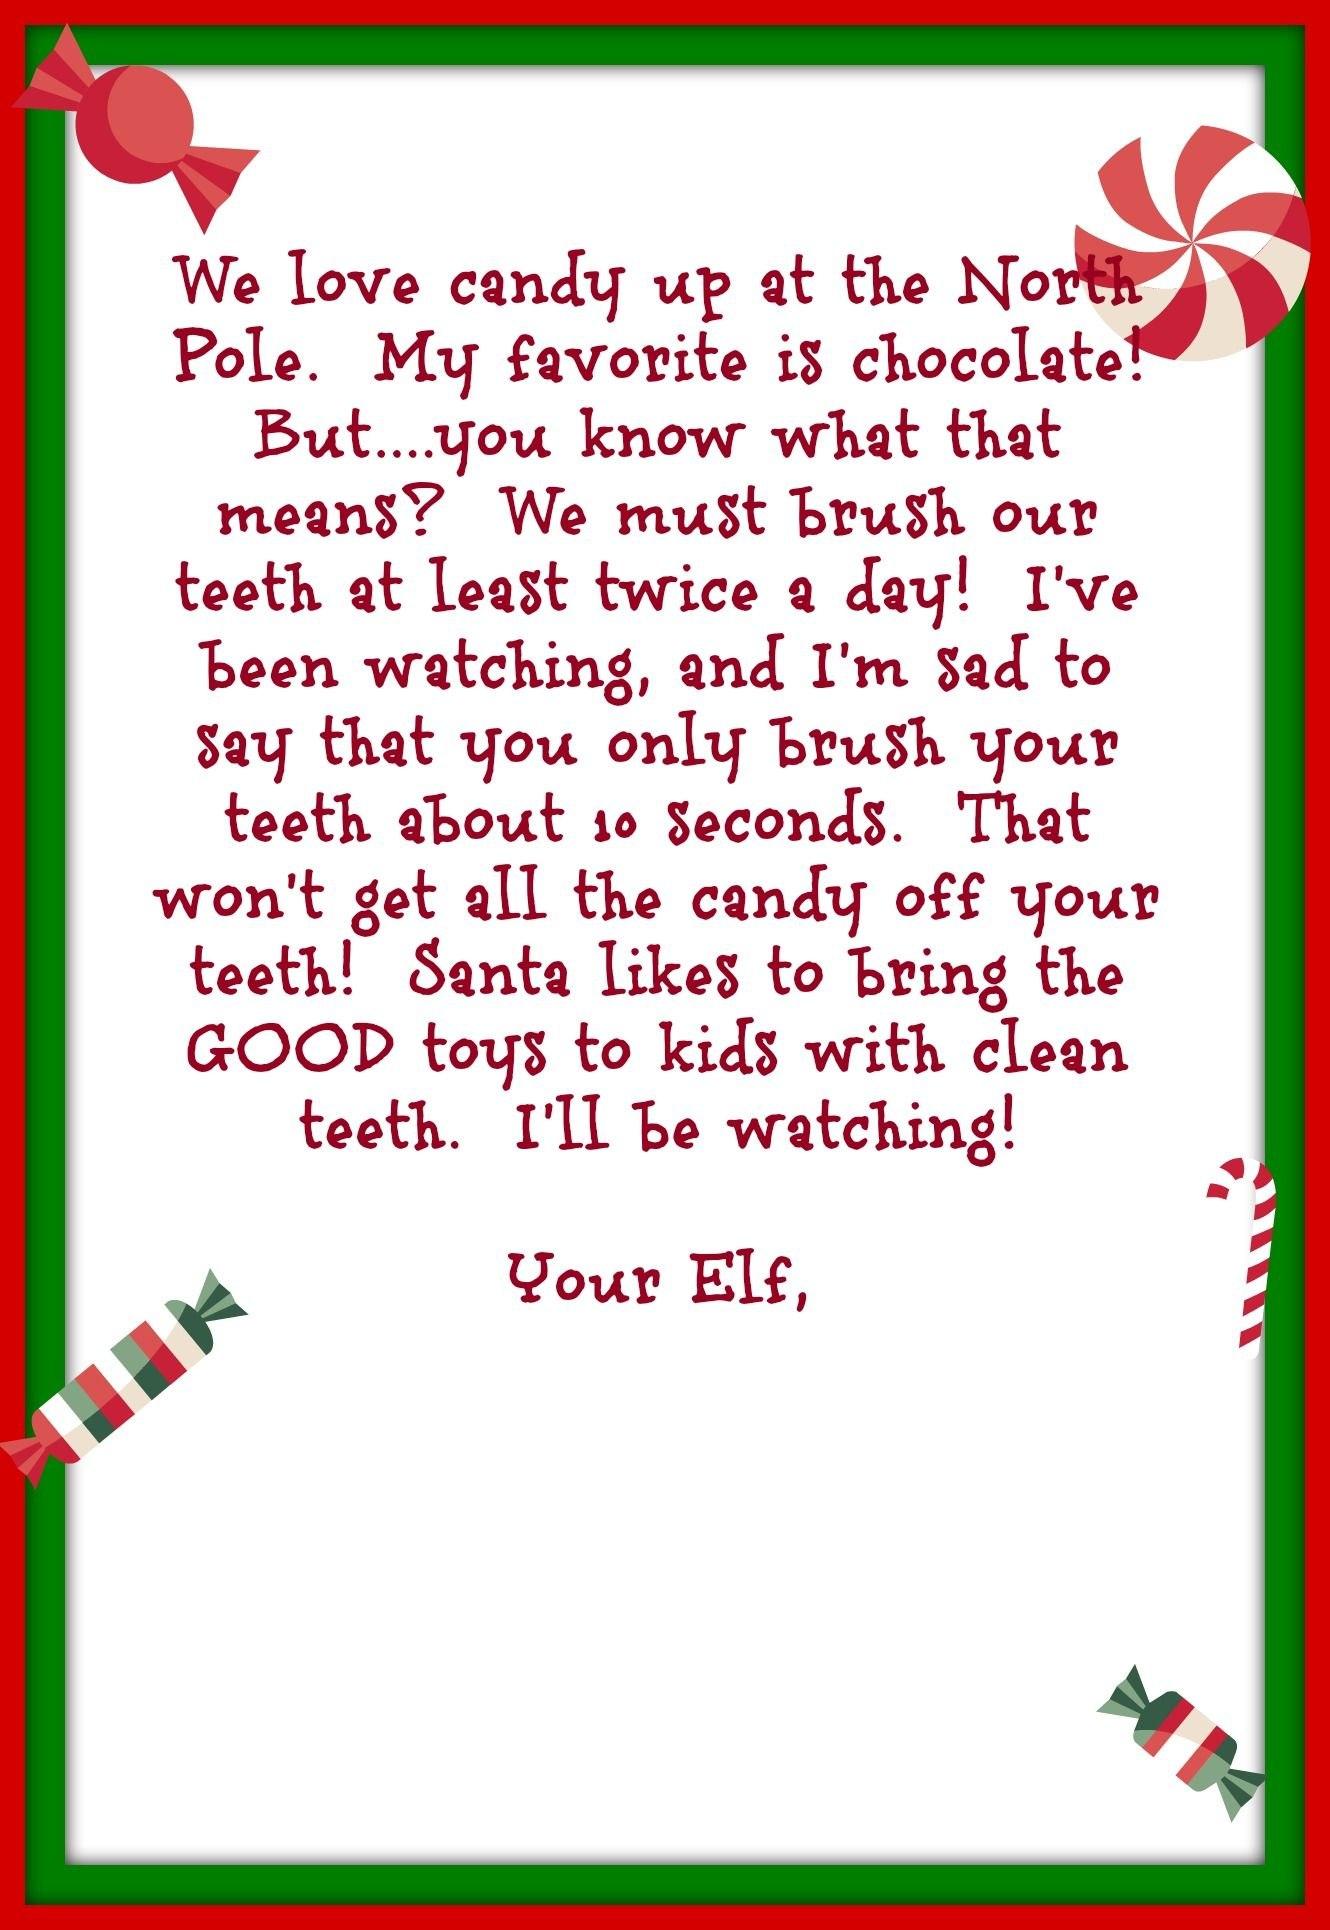 Elf On The Shelf Day   December Prek  Elf On The Shelf With Goodbye Letter From Elf On The Shelf Template